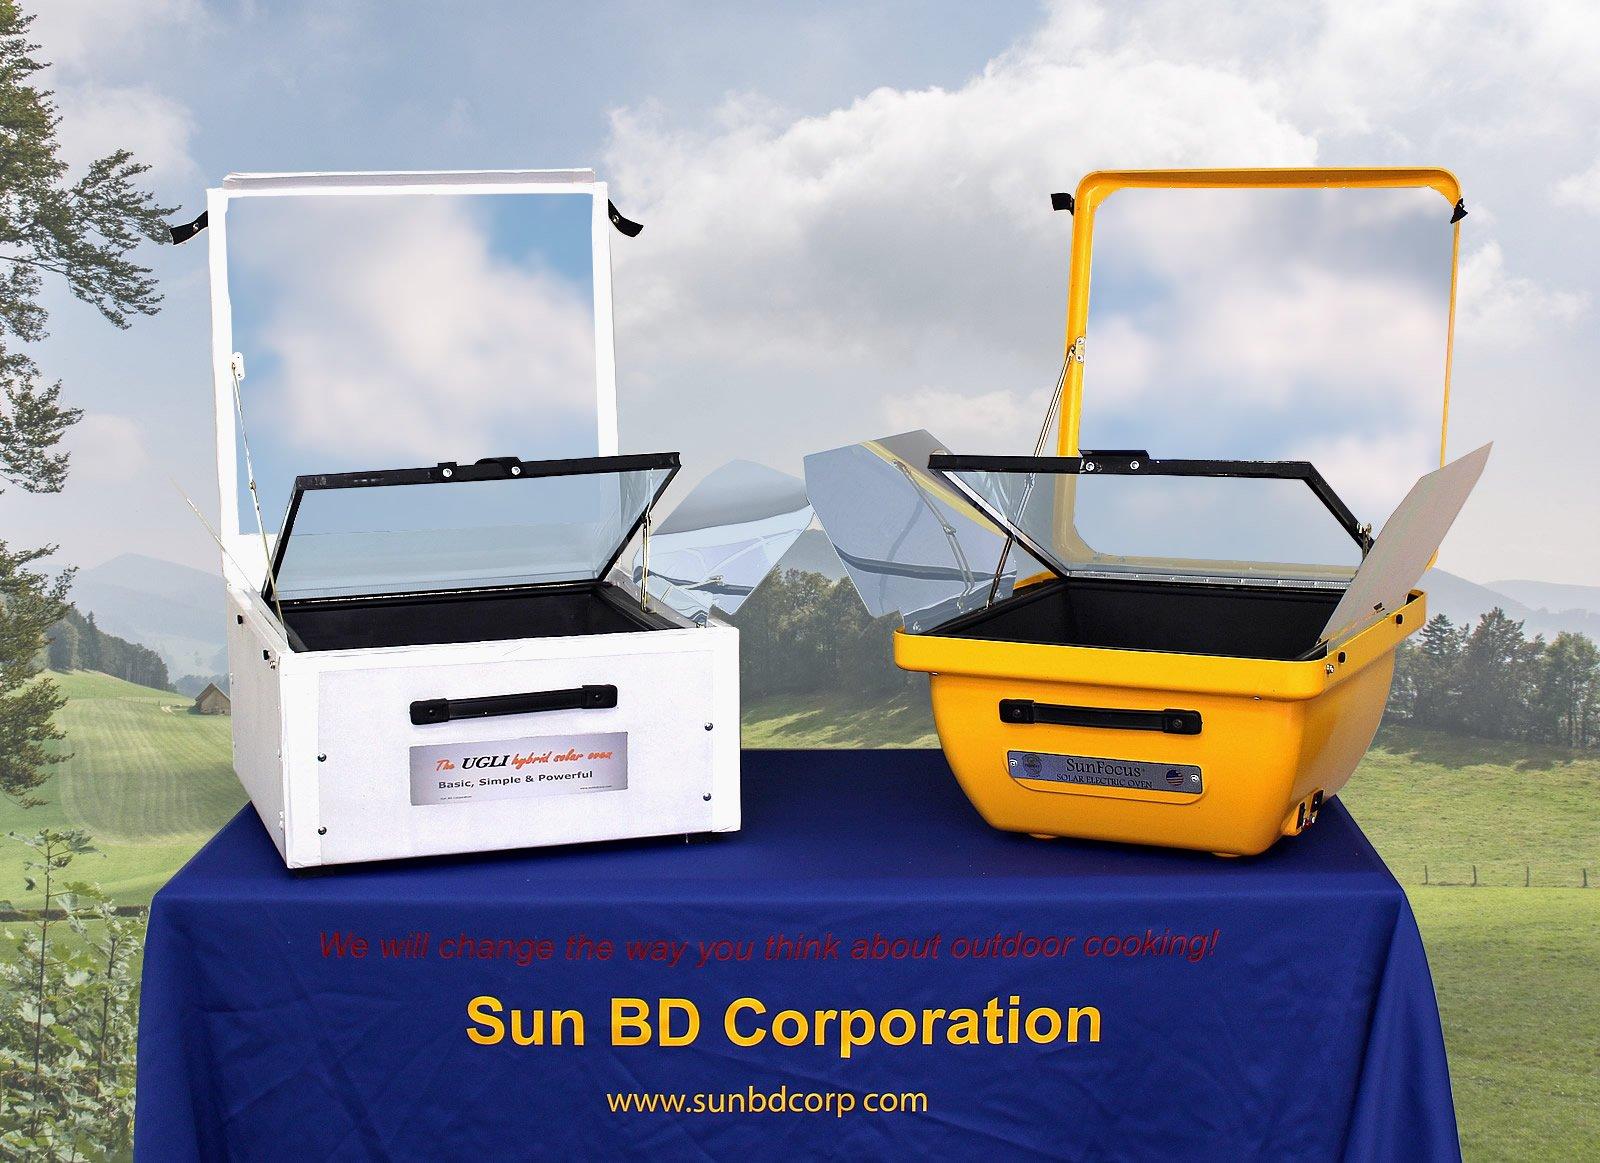 Sun BD Corporation